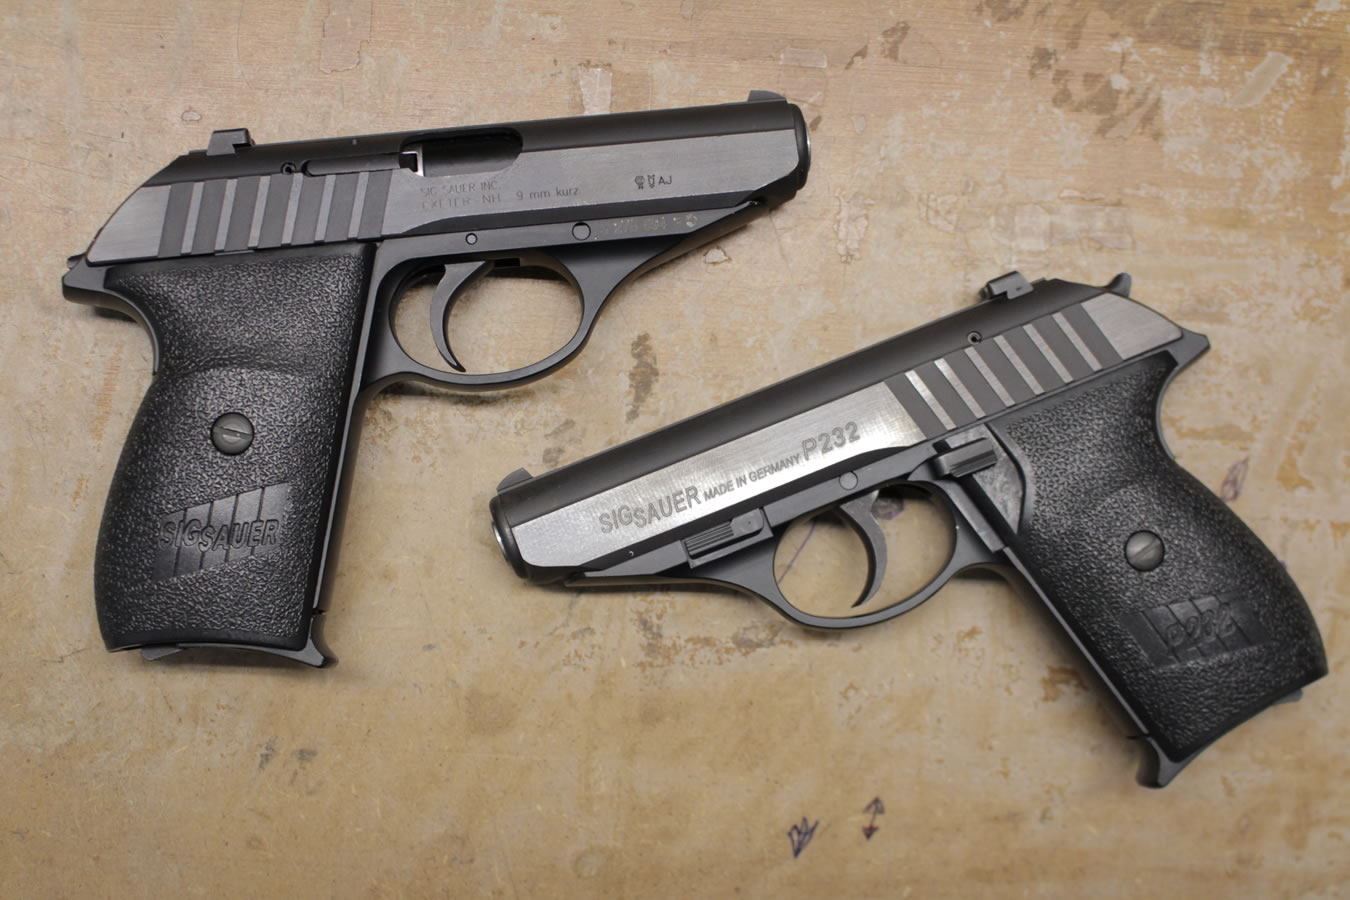 sig sauer p232 380 acp da sa police trade in pistols good condition